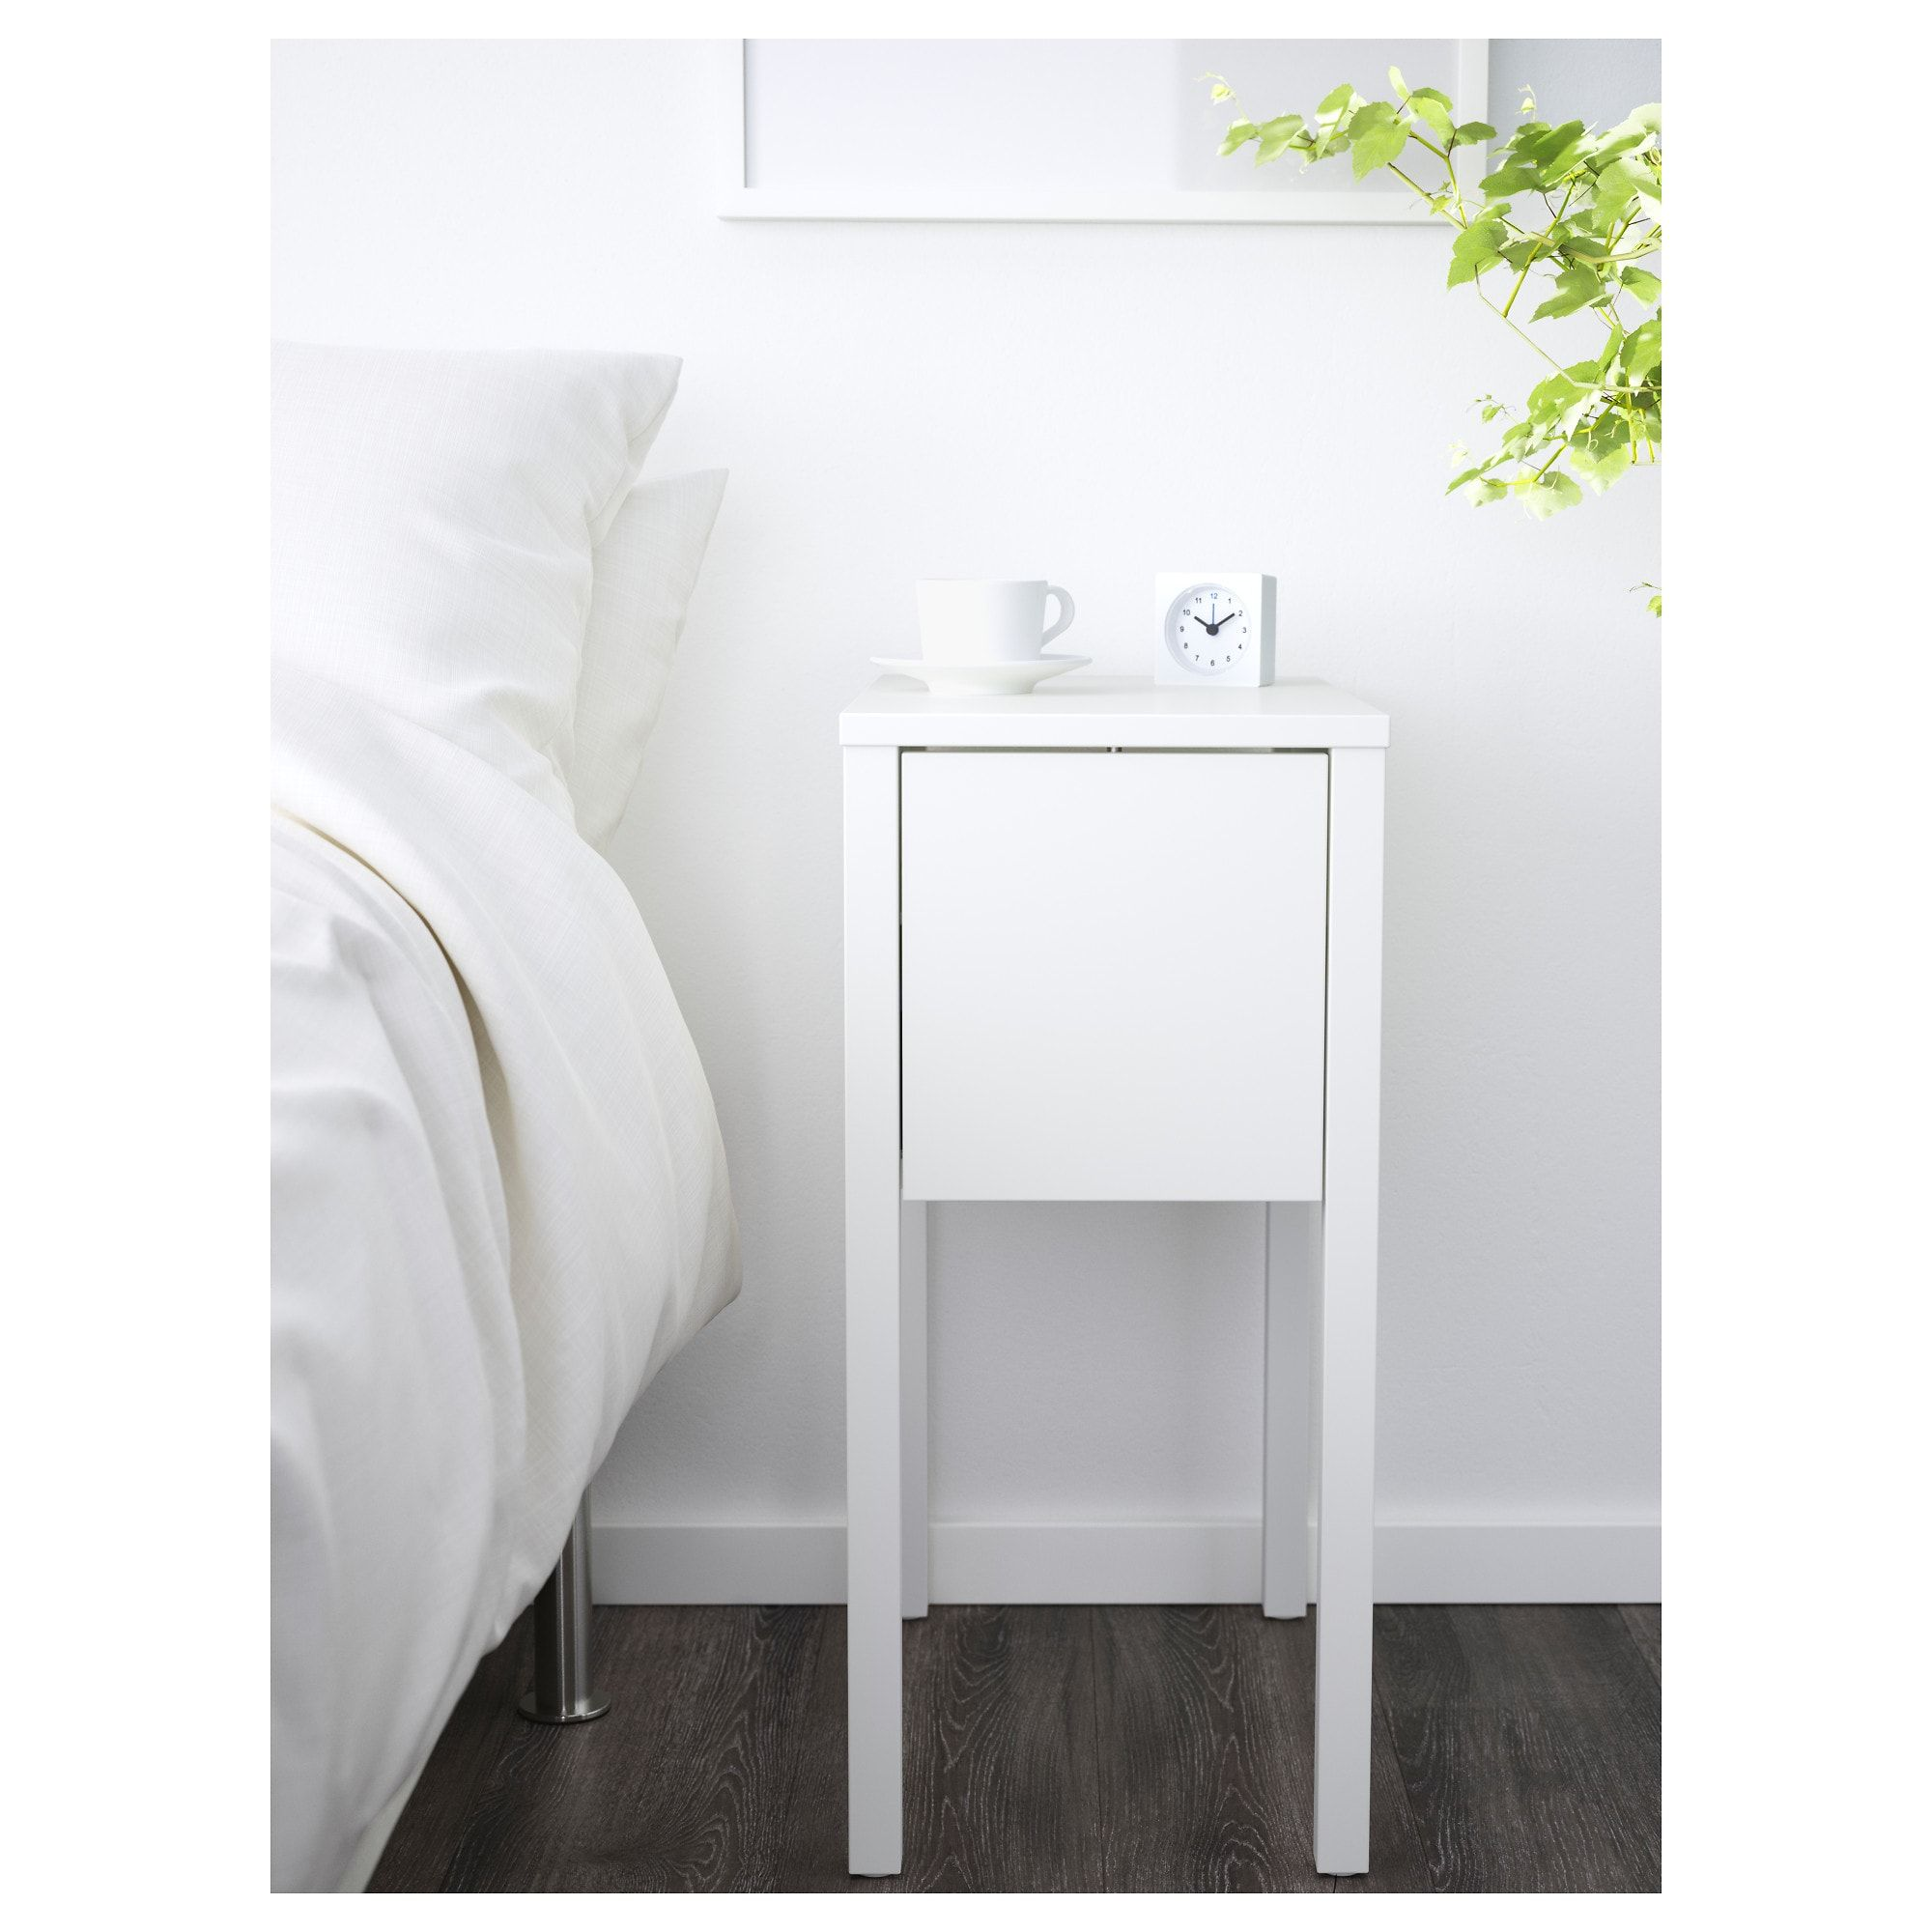 Furniture Furniture Singapore Home Decor Ikea Nordli Bedside Table Ikea Bedroom Furnishings